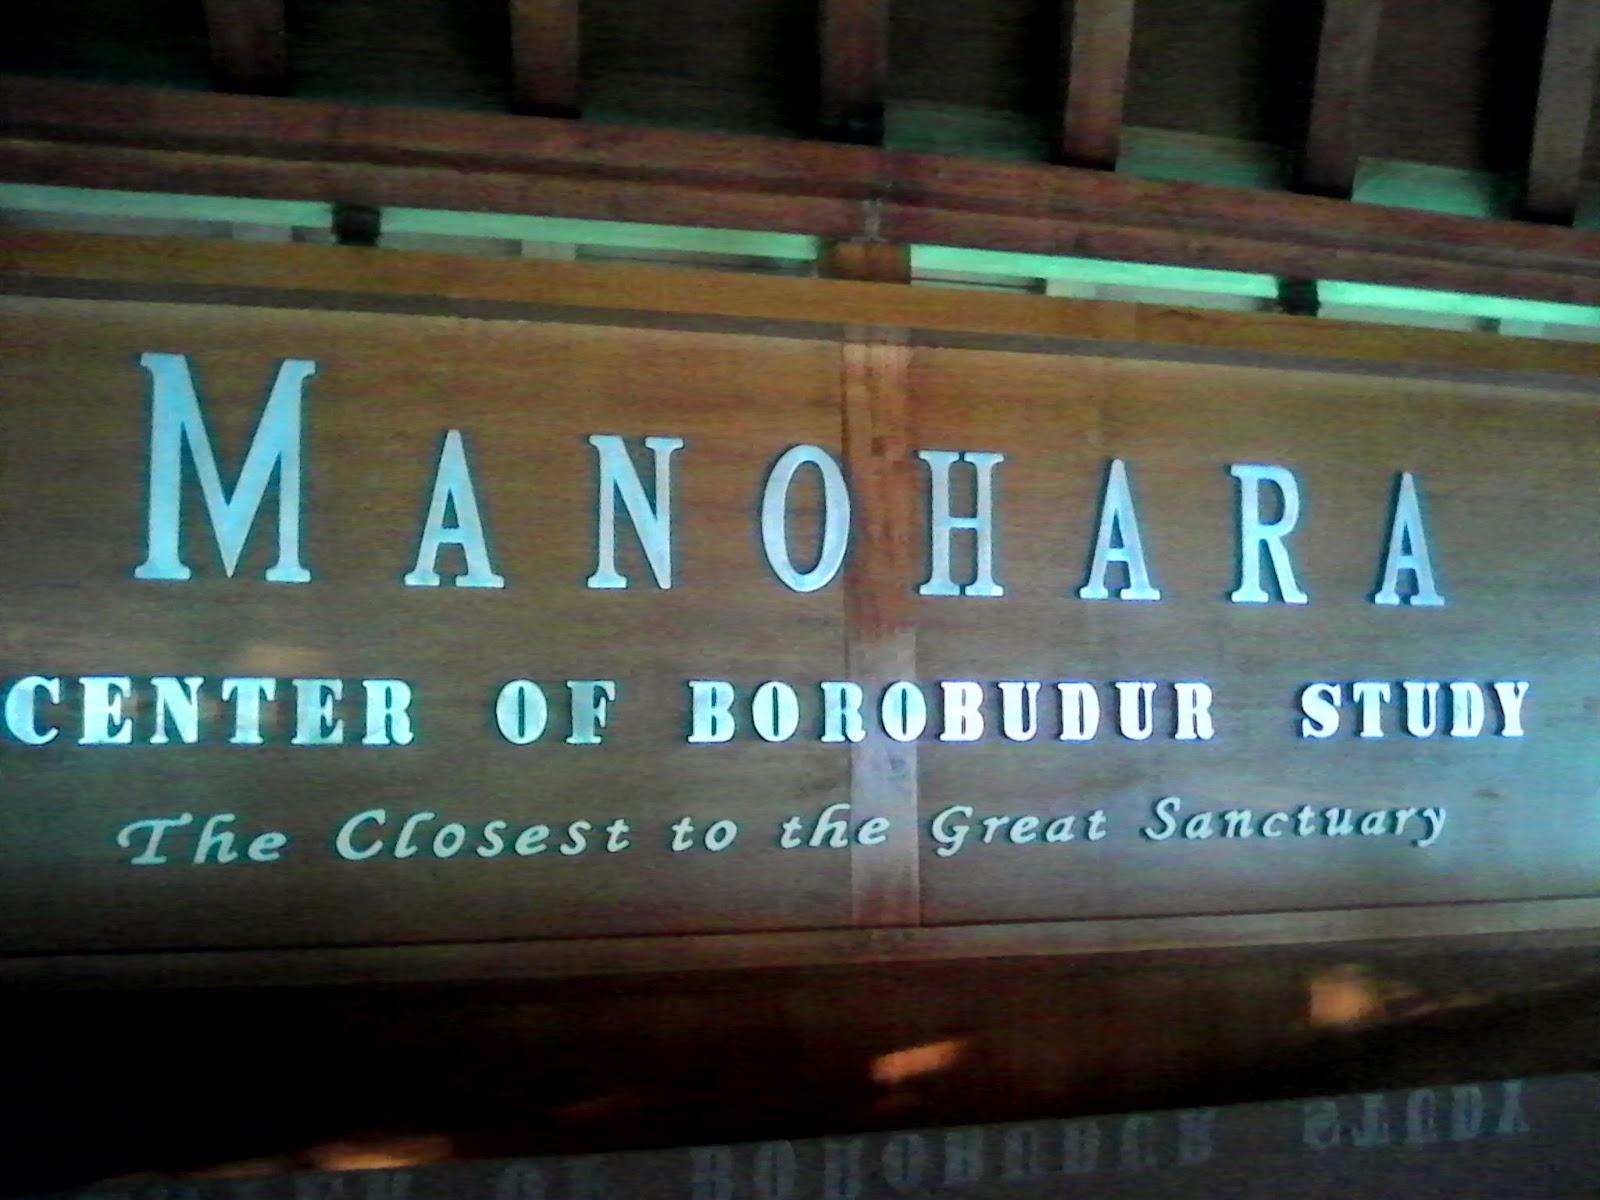 manohara hotel, borobudur